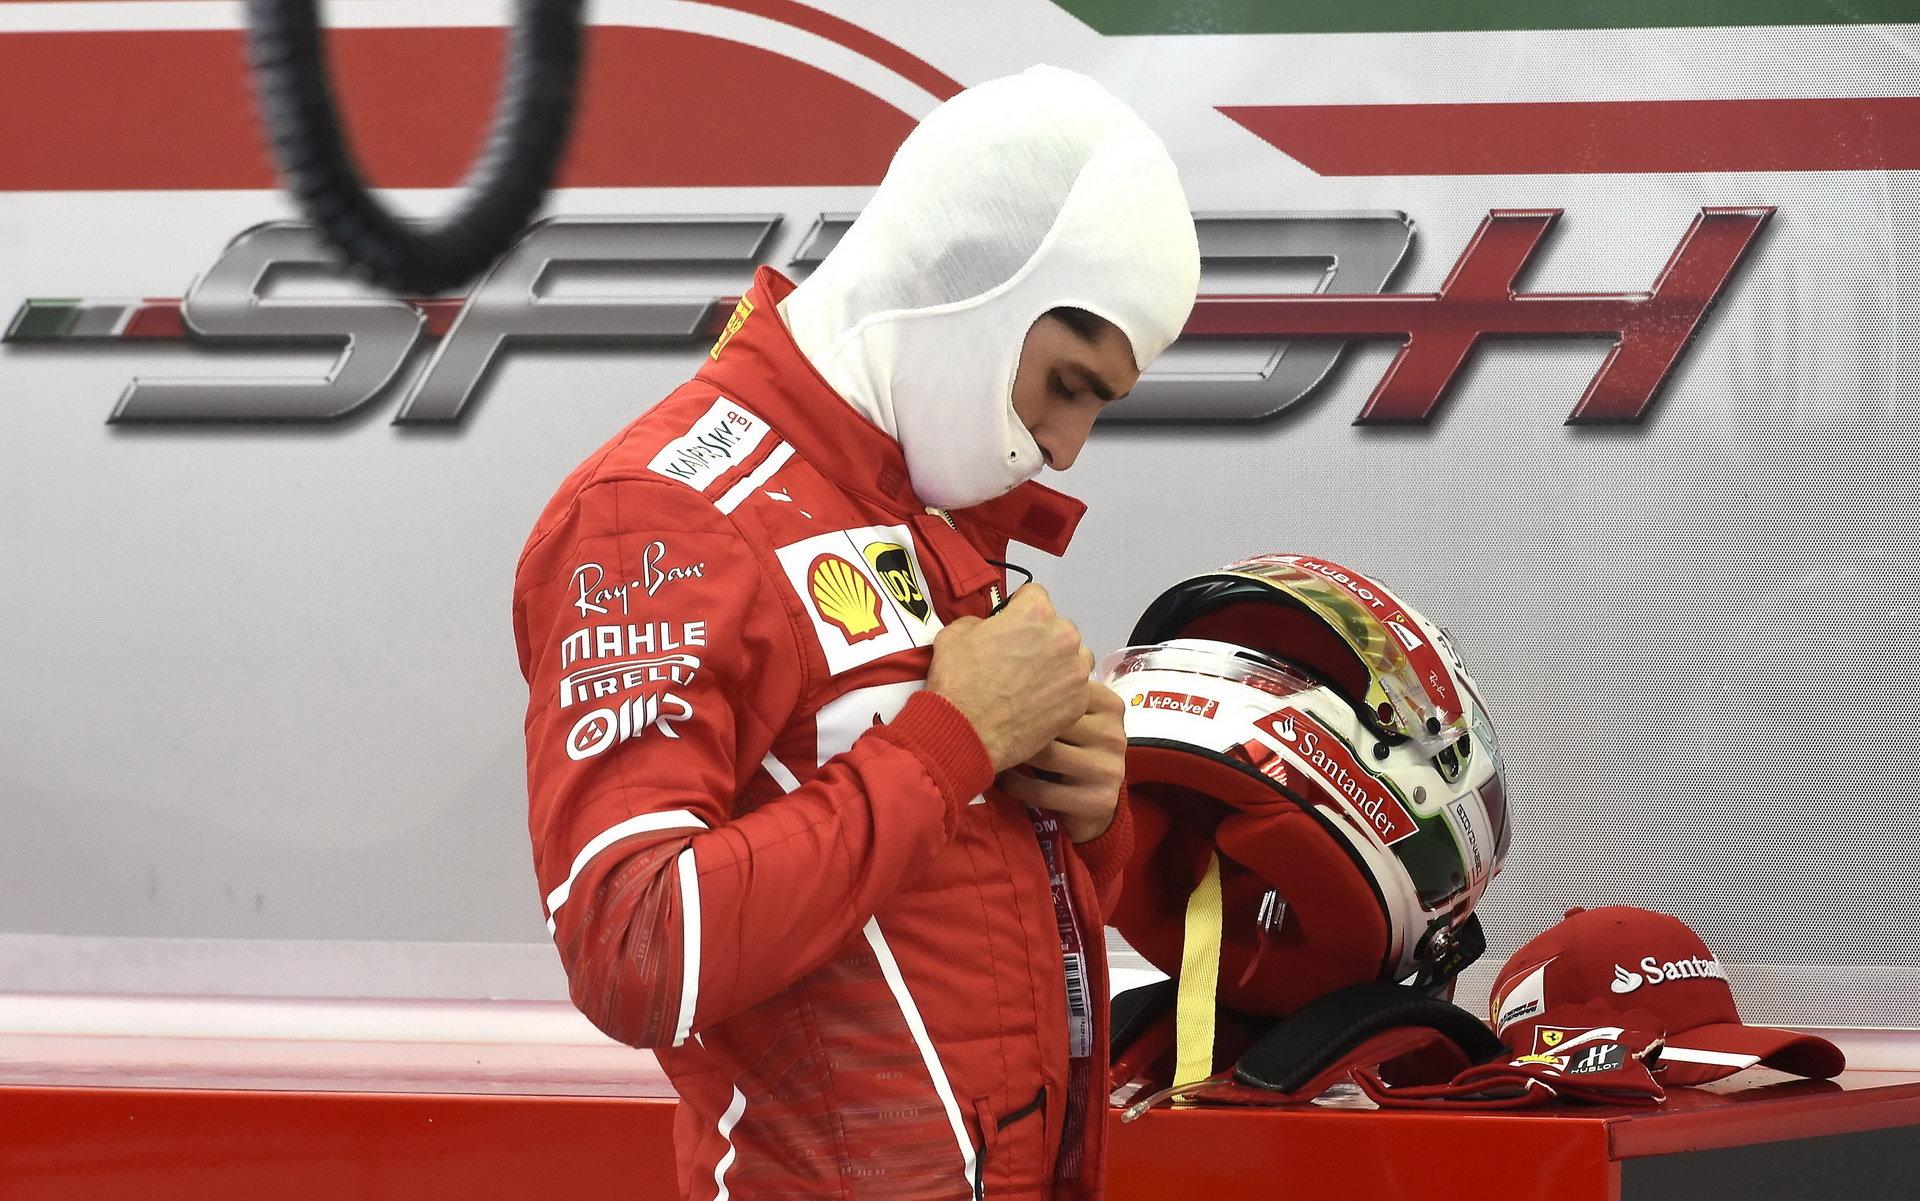 Antonio Giovinazzi vyměnil Sauber za Ferrari